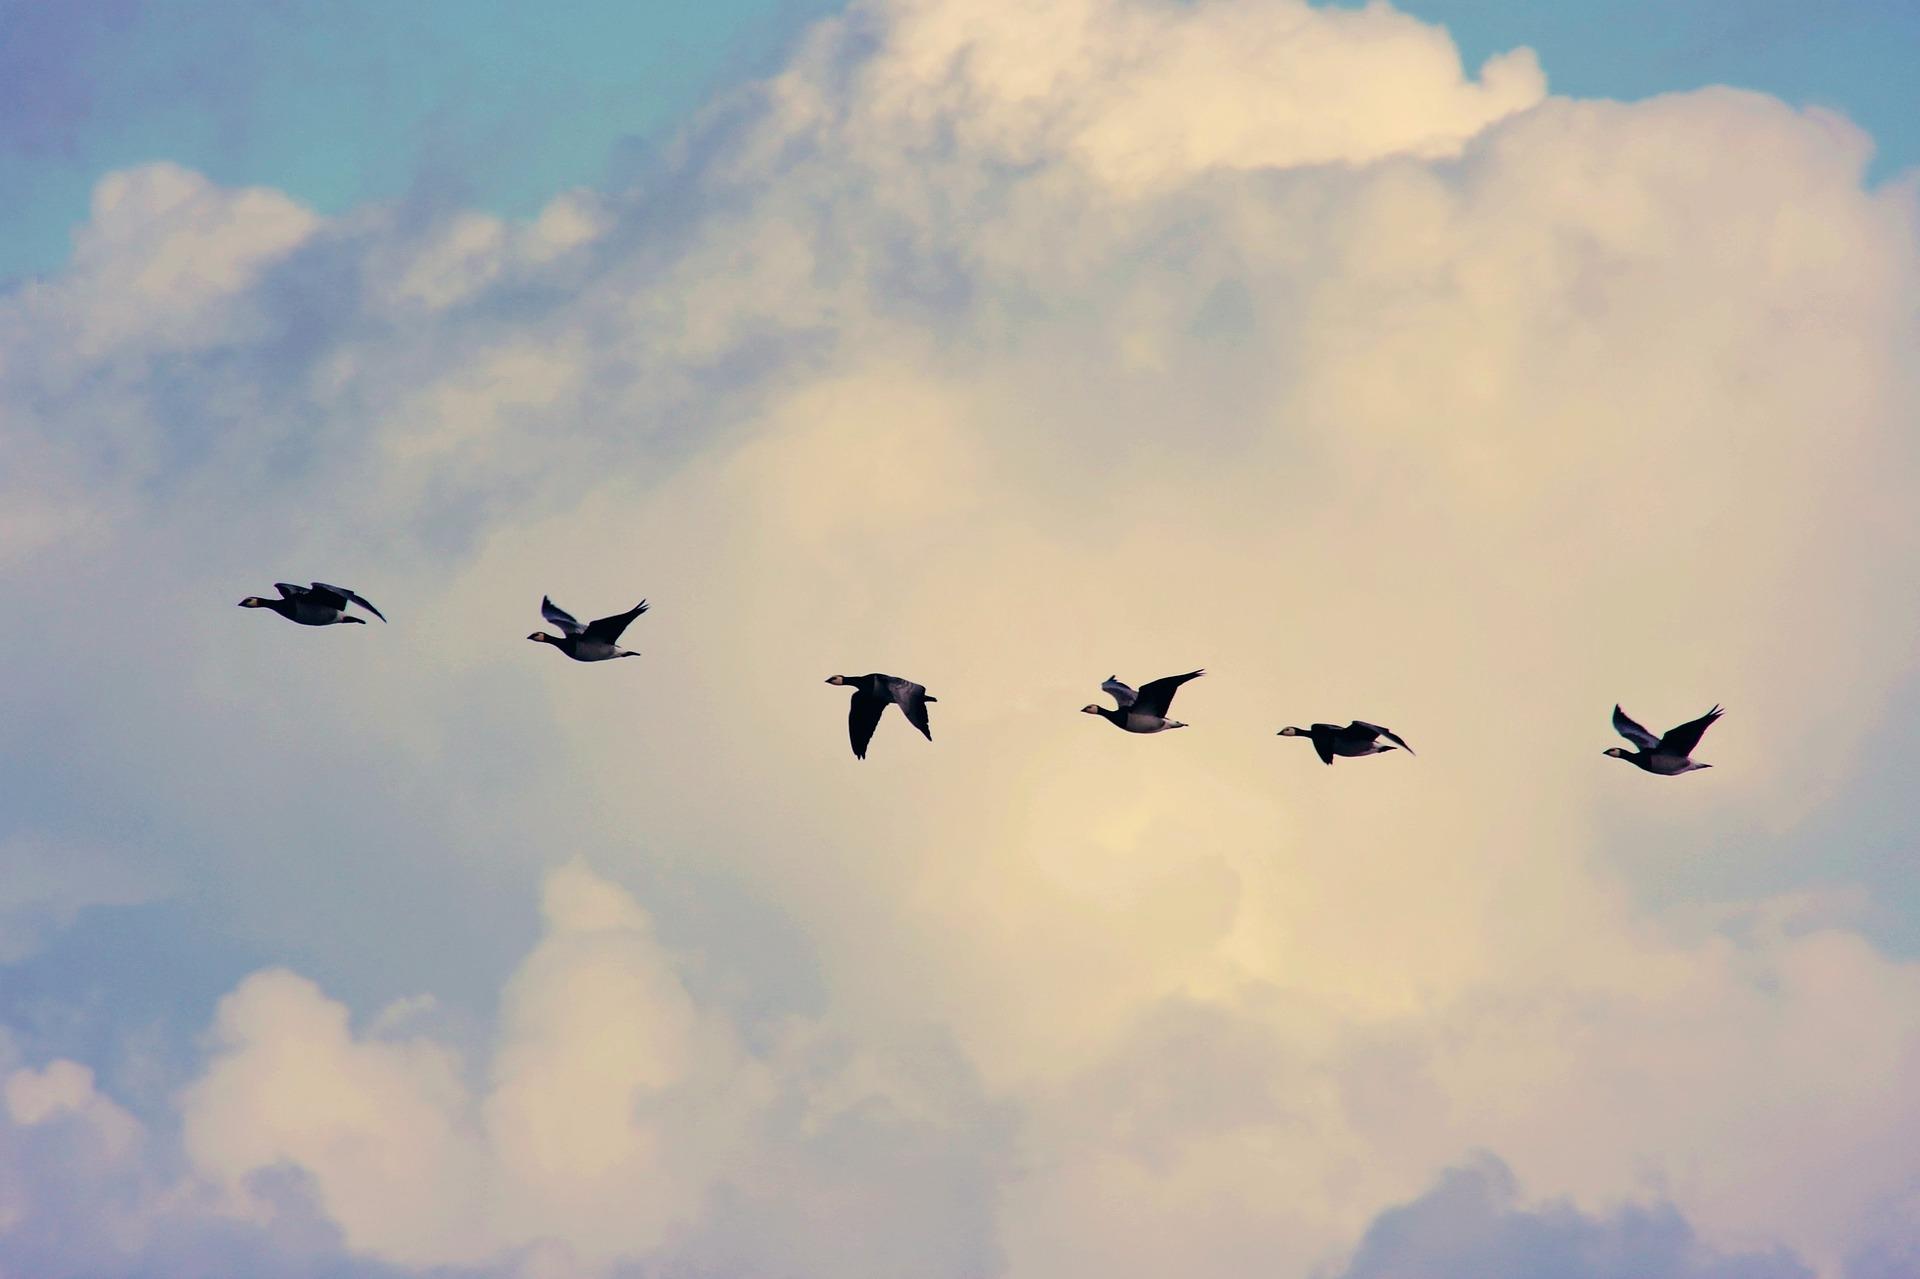 bird-migration-4023842_1920.jpg